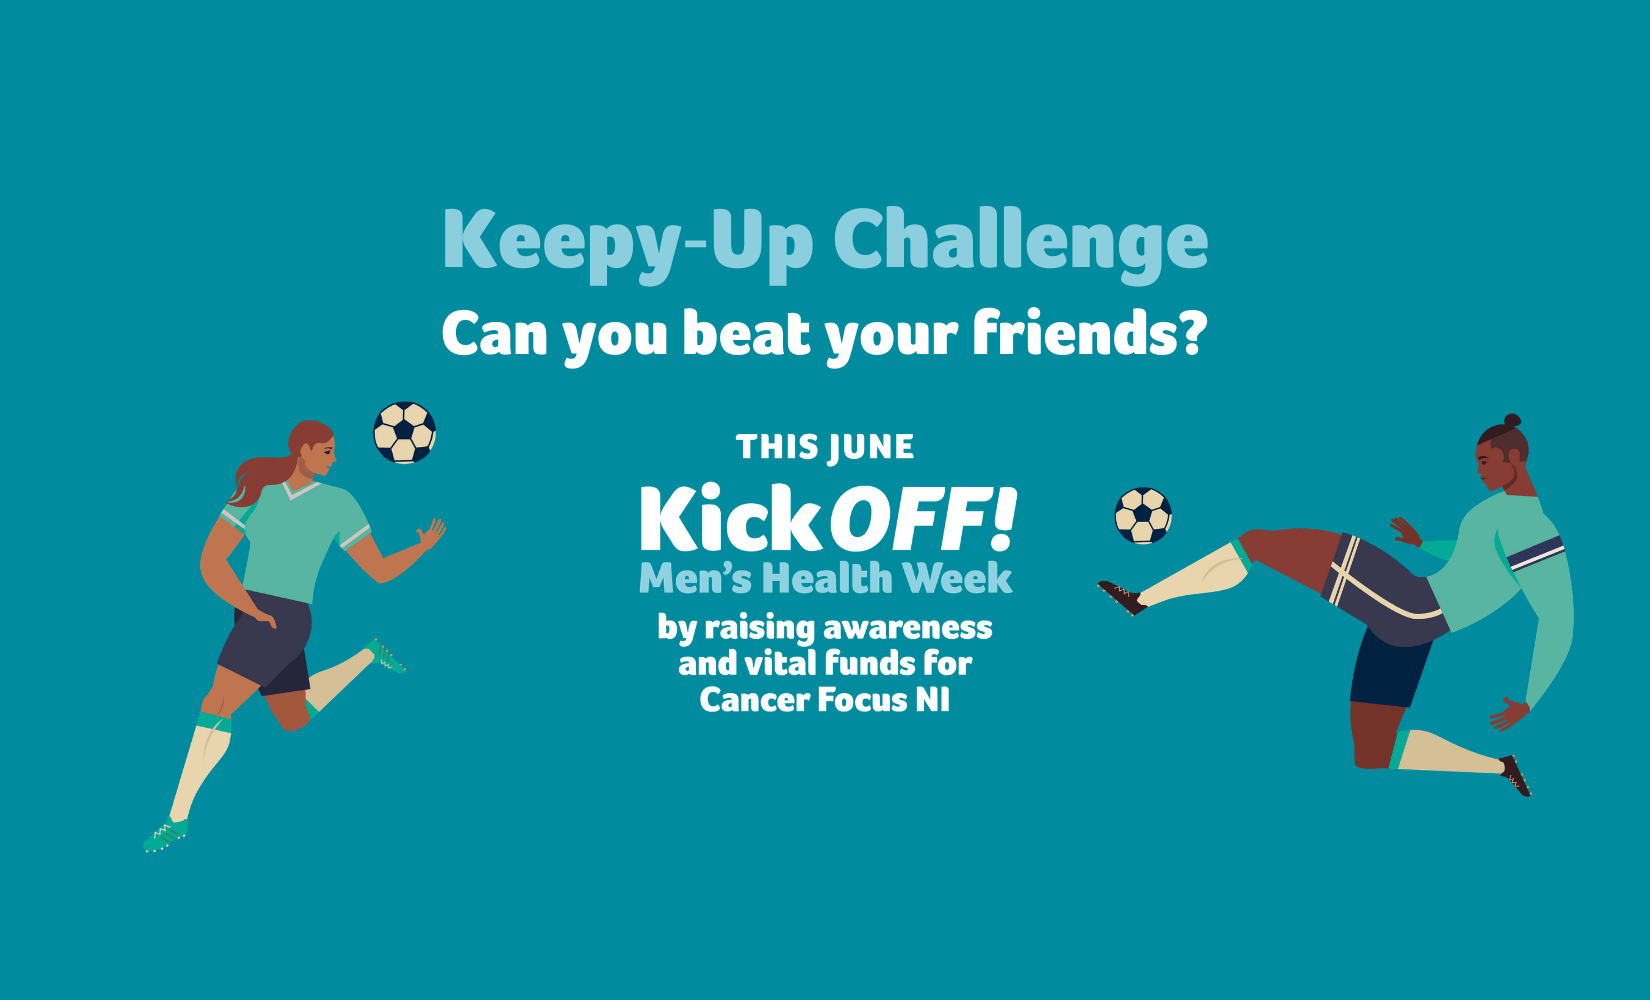 Kick OFF! The Keepy-Up Challenge